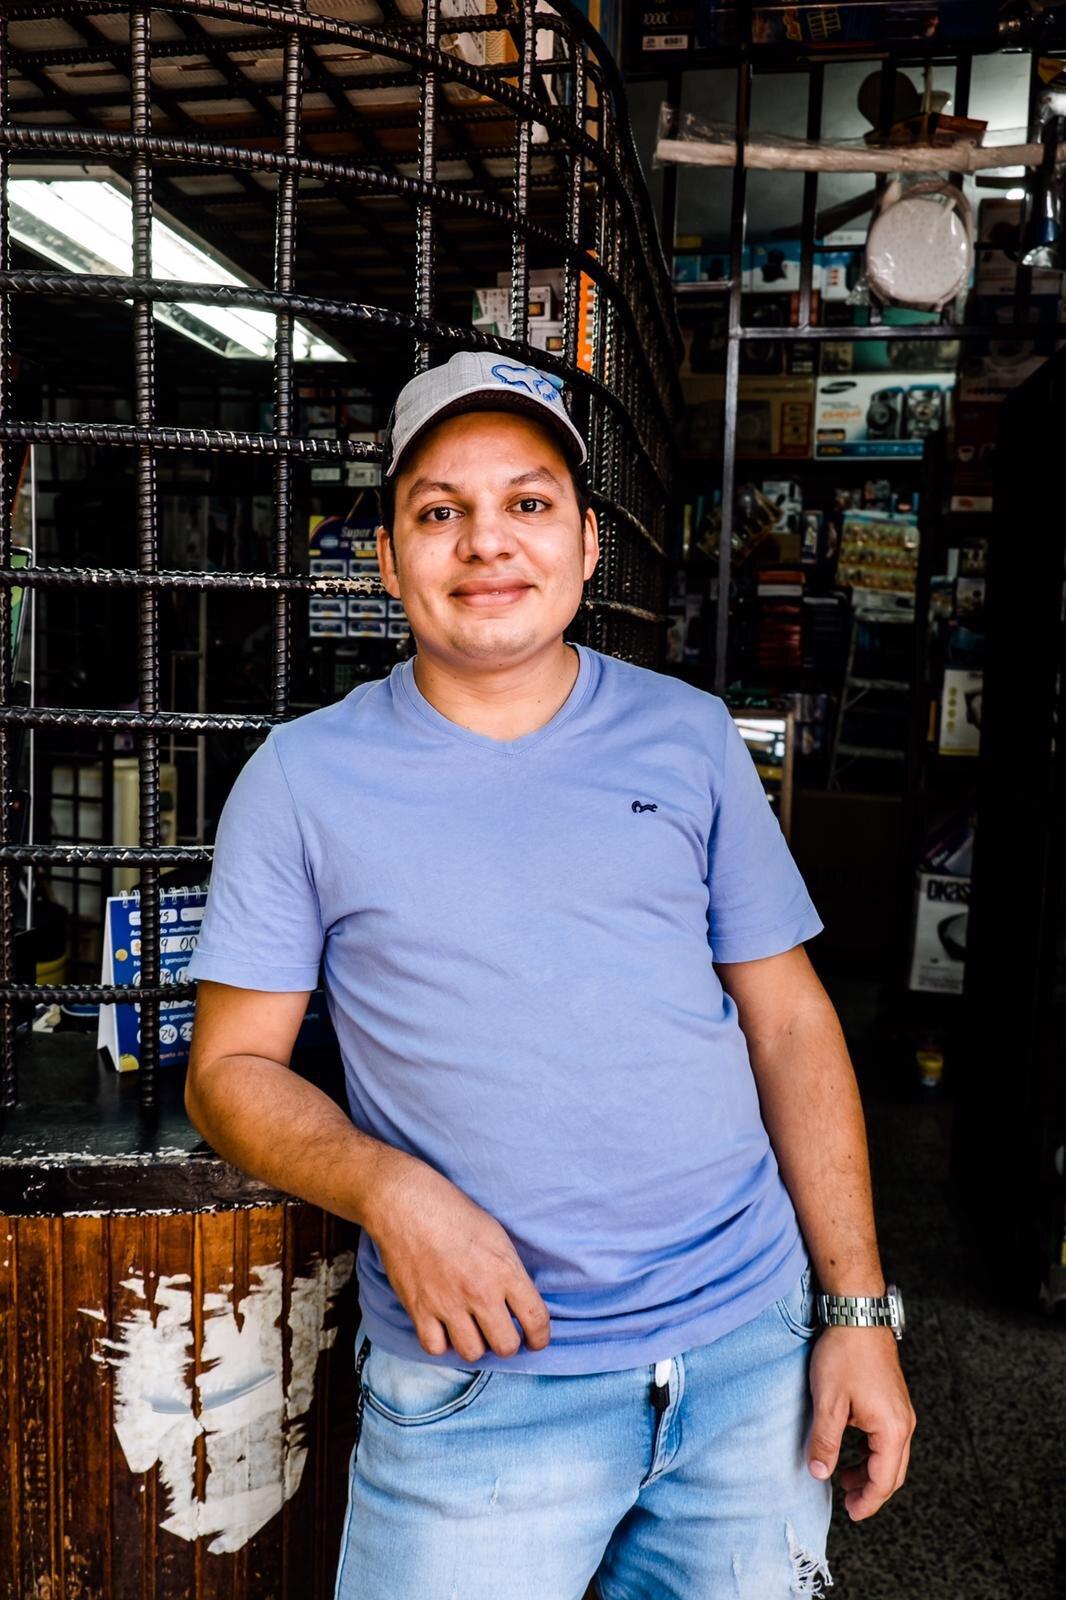 Franklin Usme Gómez - The telephone repairman of San Carlos